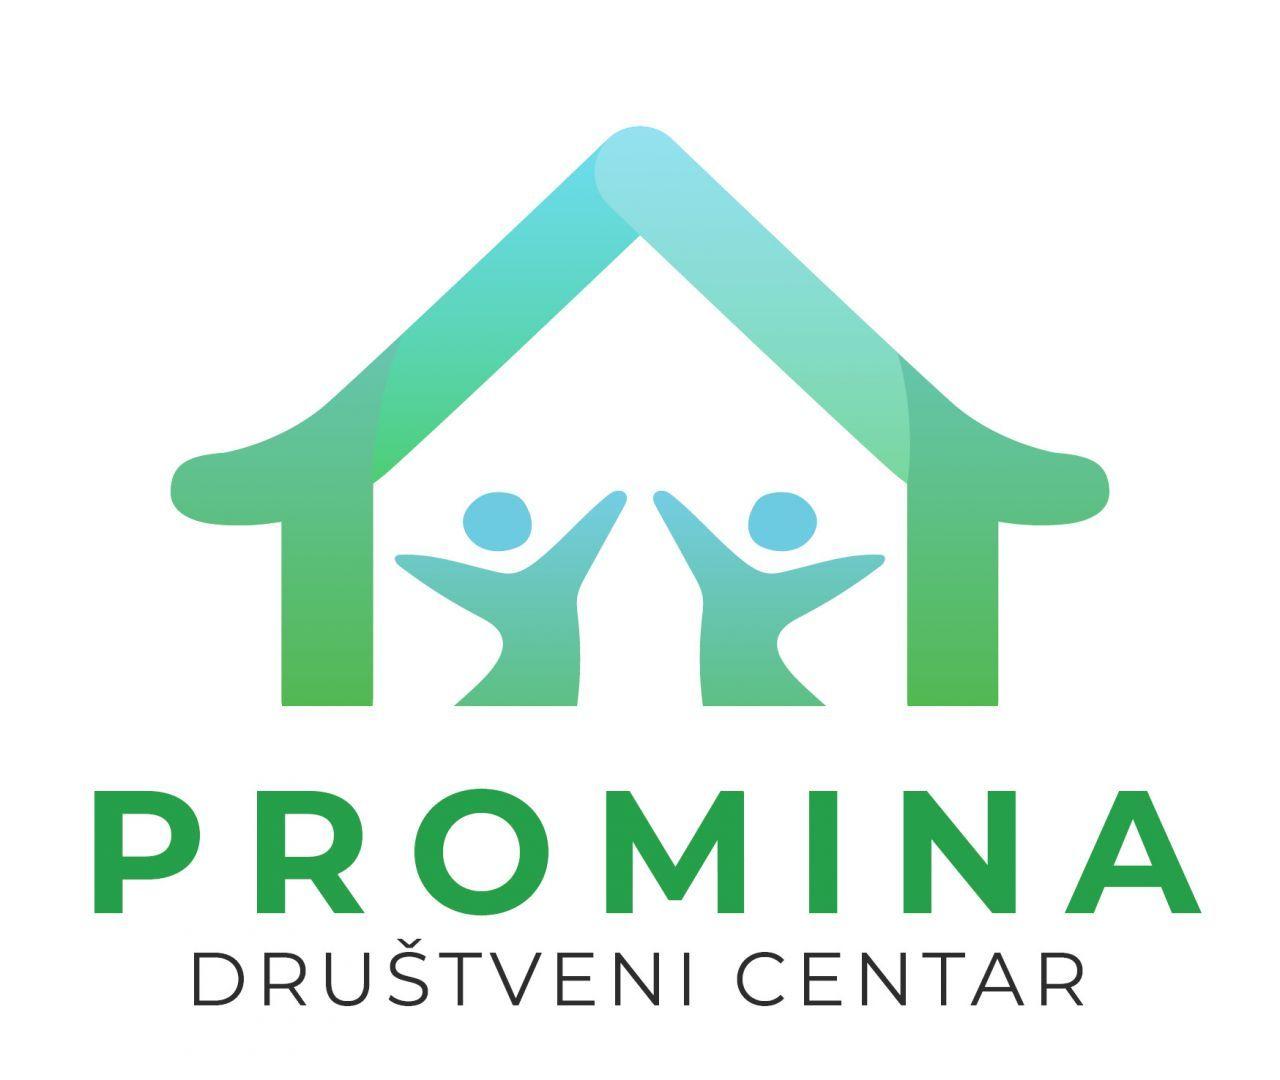 Društveni centar Promina - kalendar događanja za 02/2021.